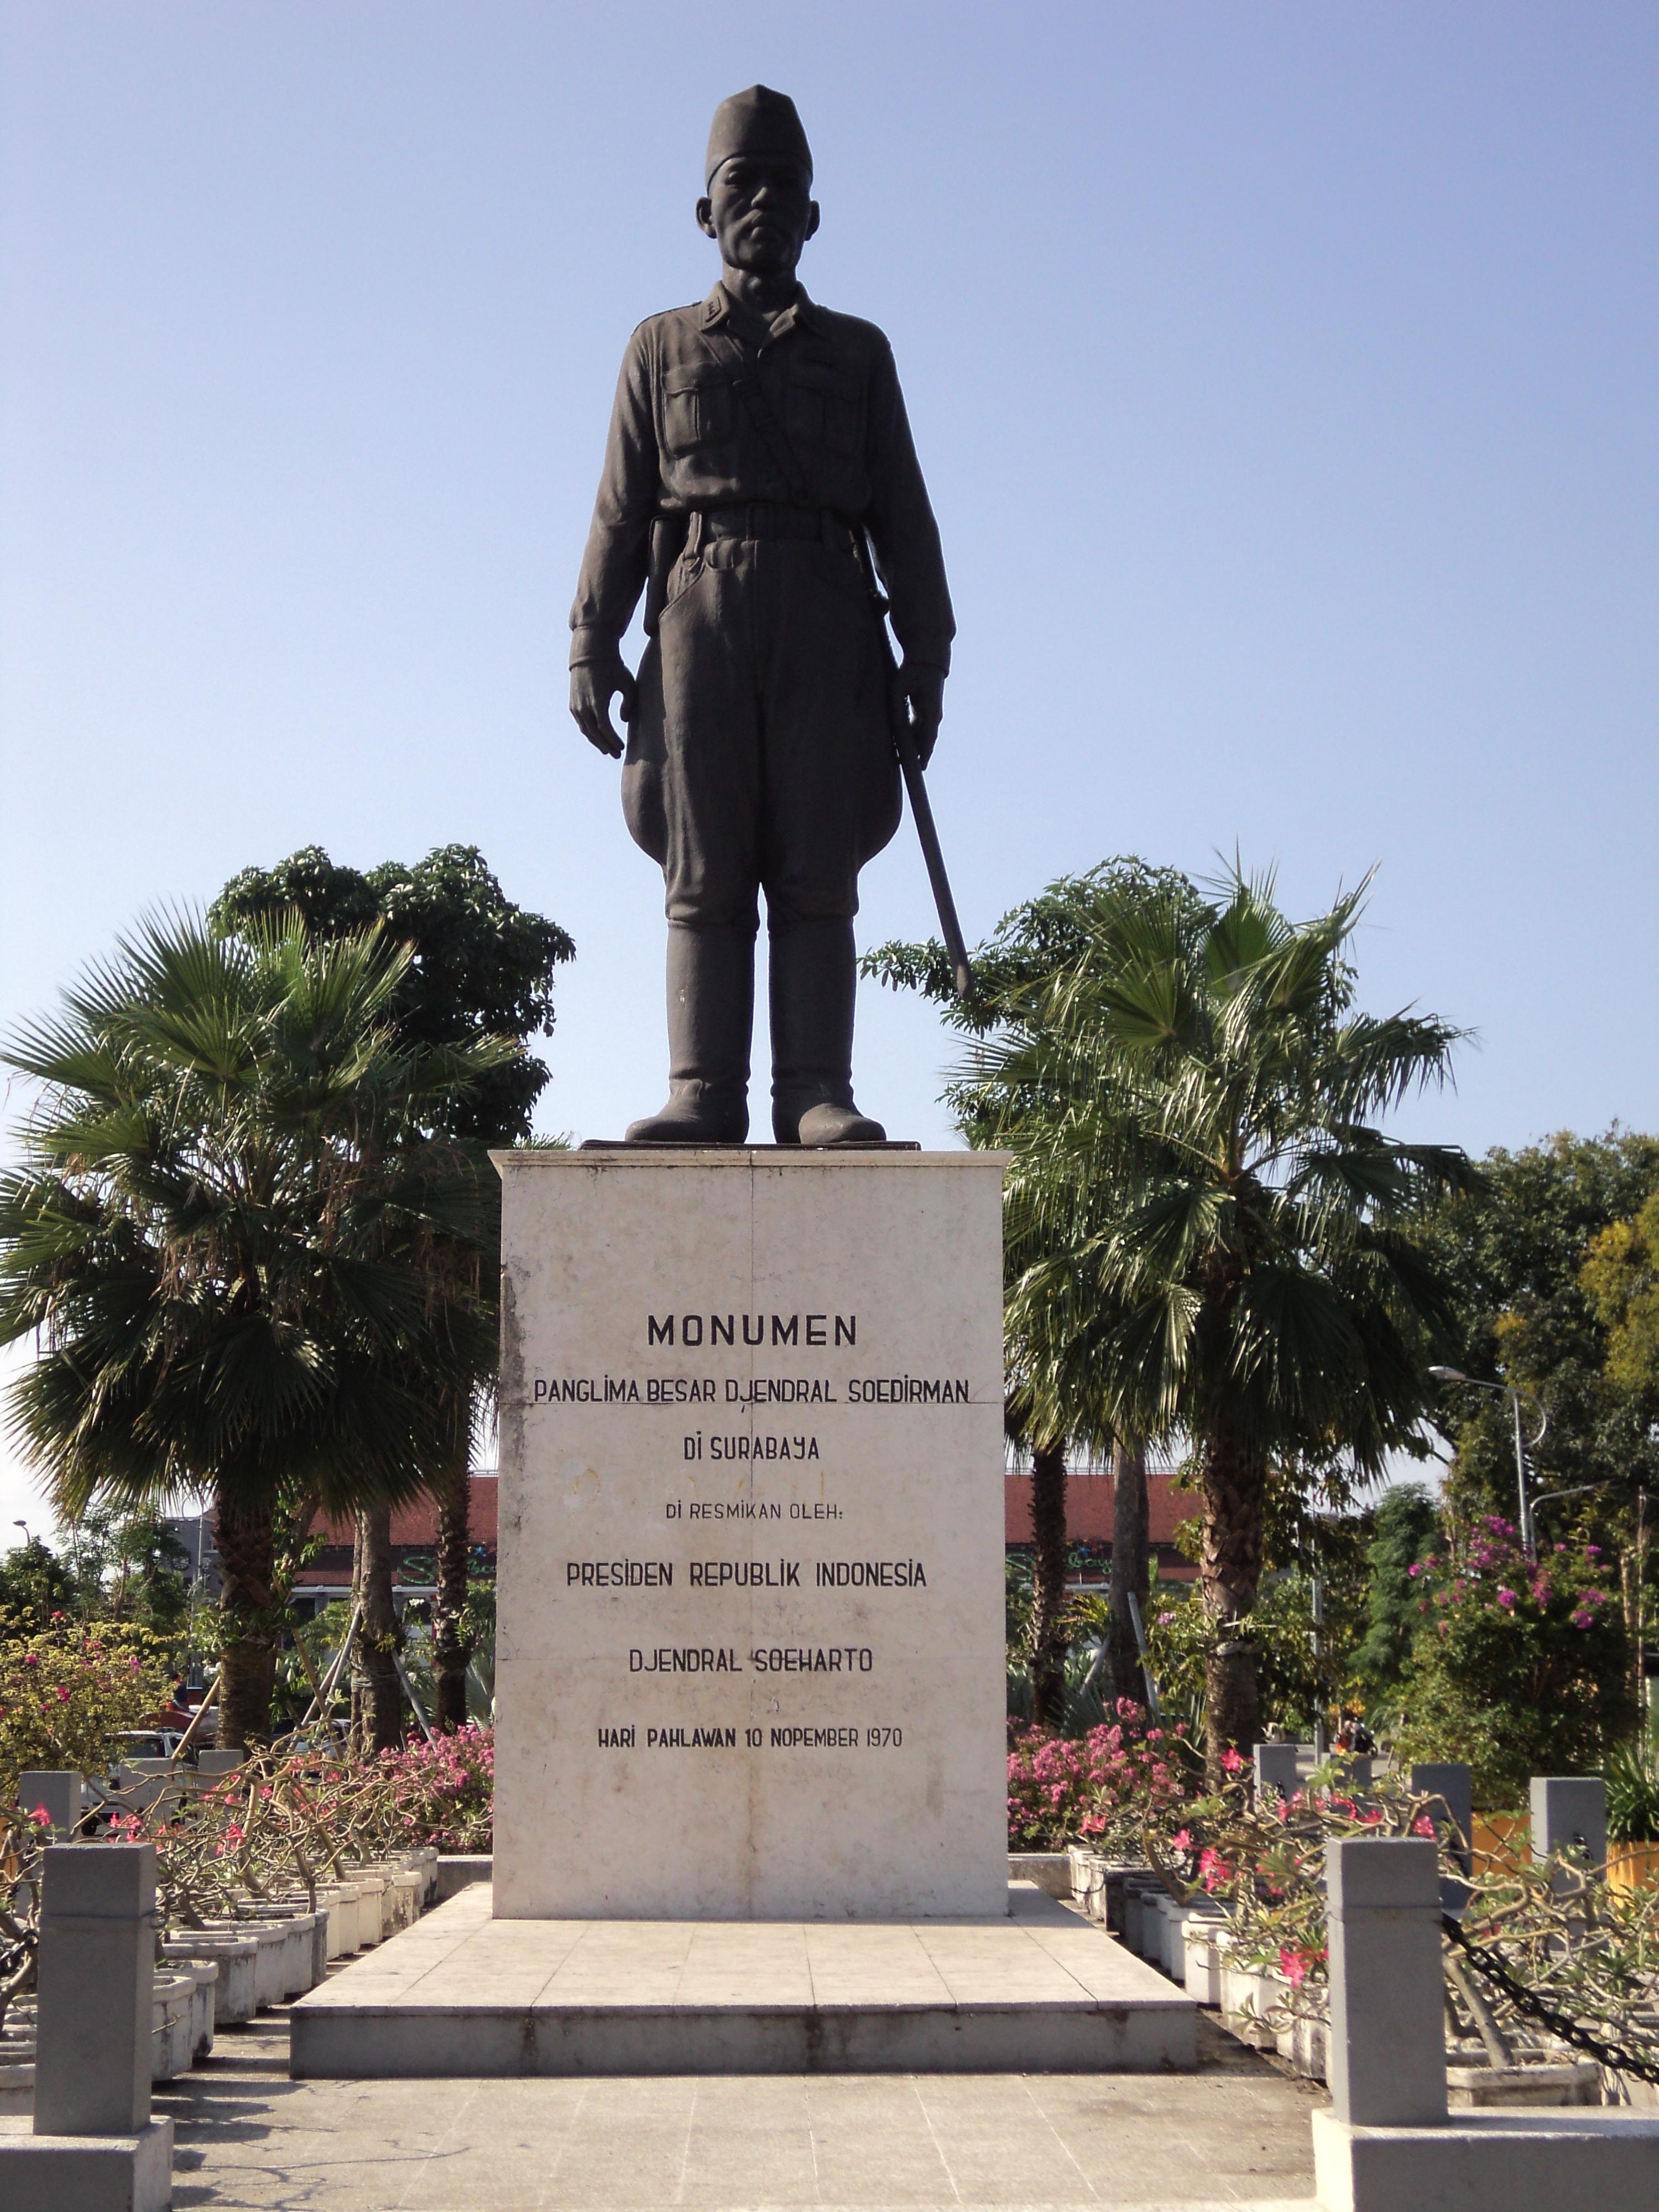 Monumen Surabaya Laman 3 Jenderal Sudirman Wisata Pahlawan Kota